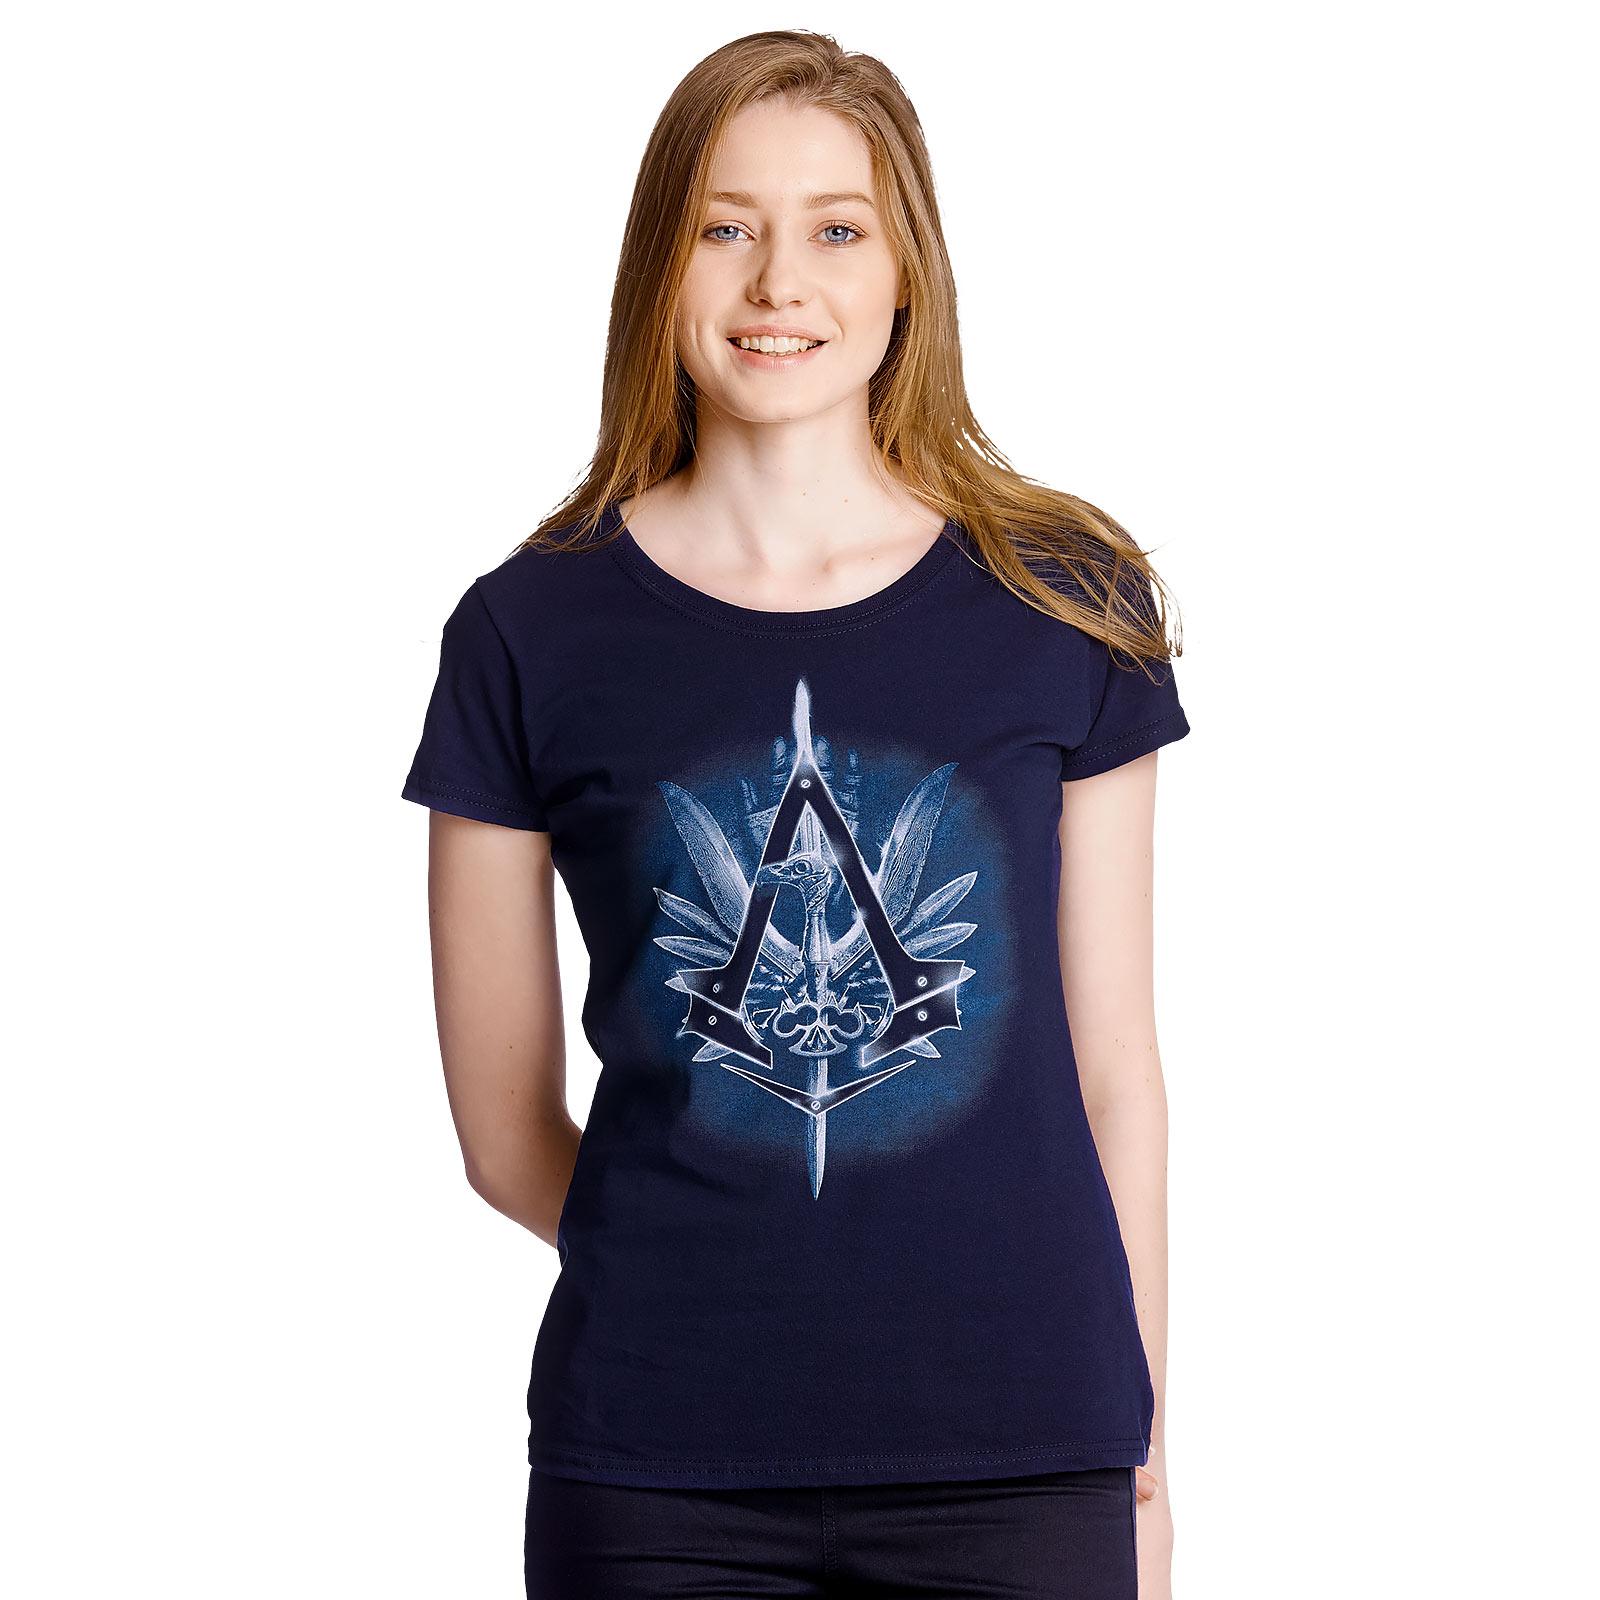 Assassins Creed - Syndicate Logo Girlie Shirt